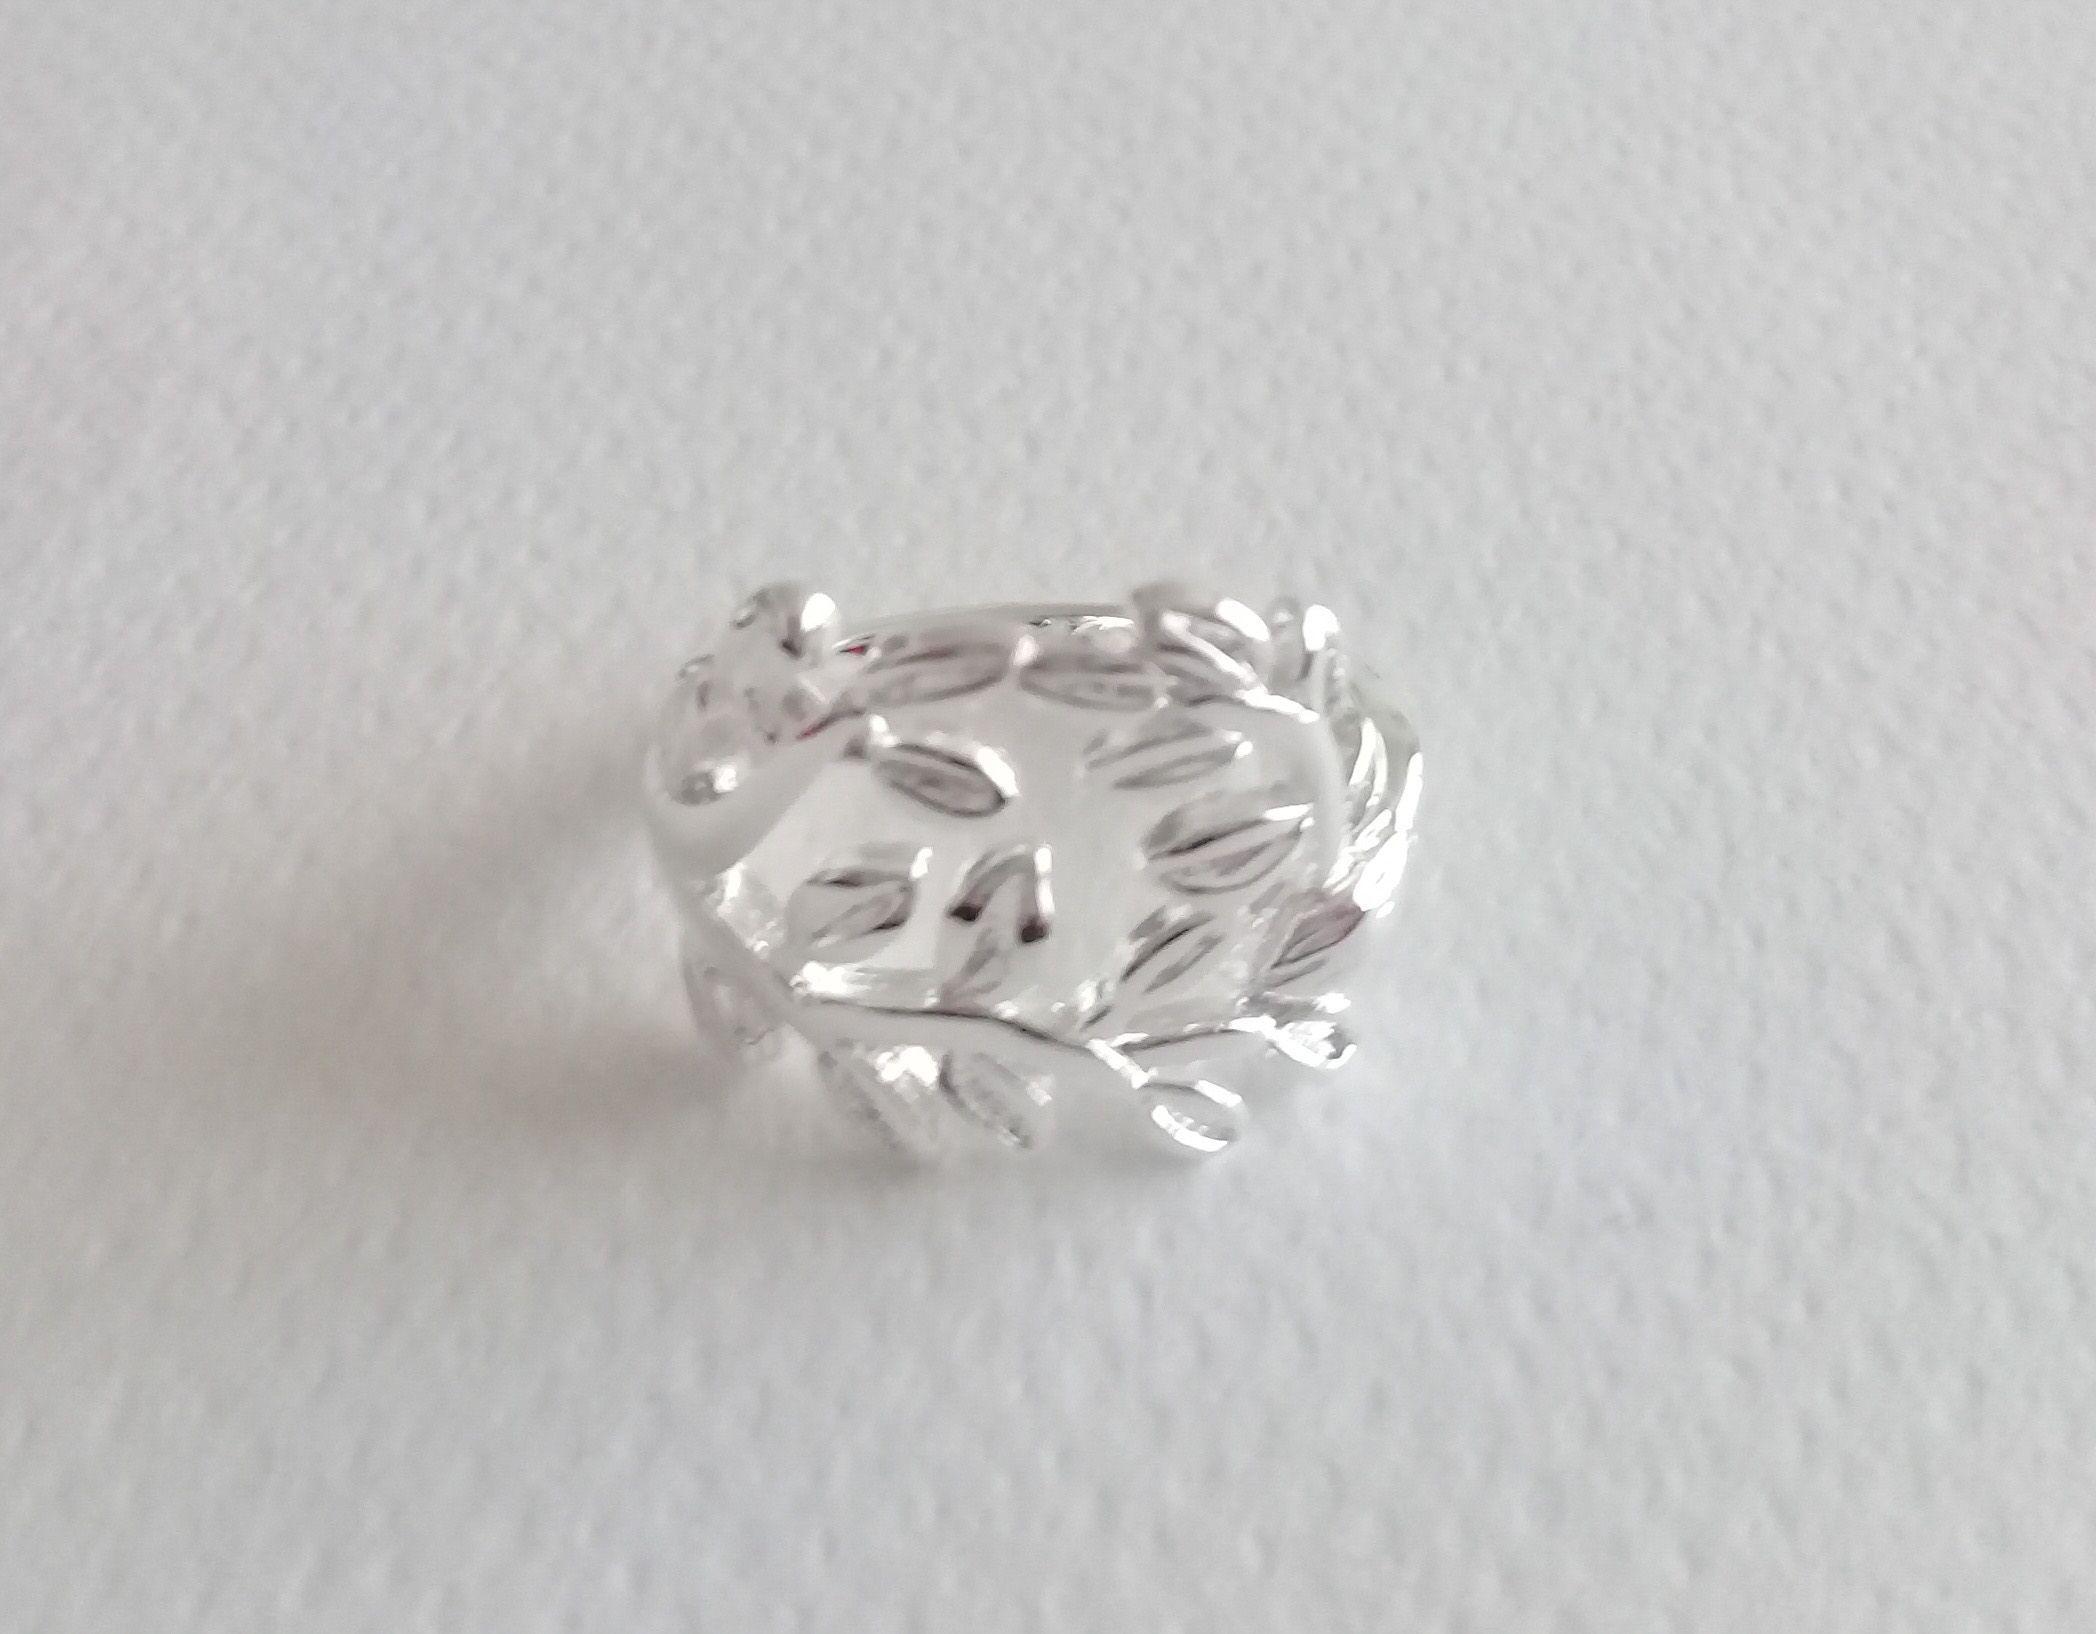 Anillos en plata 925, encontrá tu estilo!! #iloverings #plata925  https://accessoriescorner.com.uy